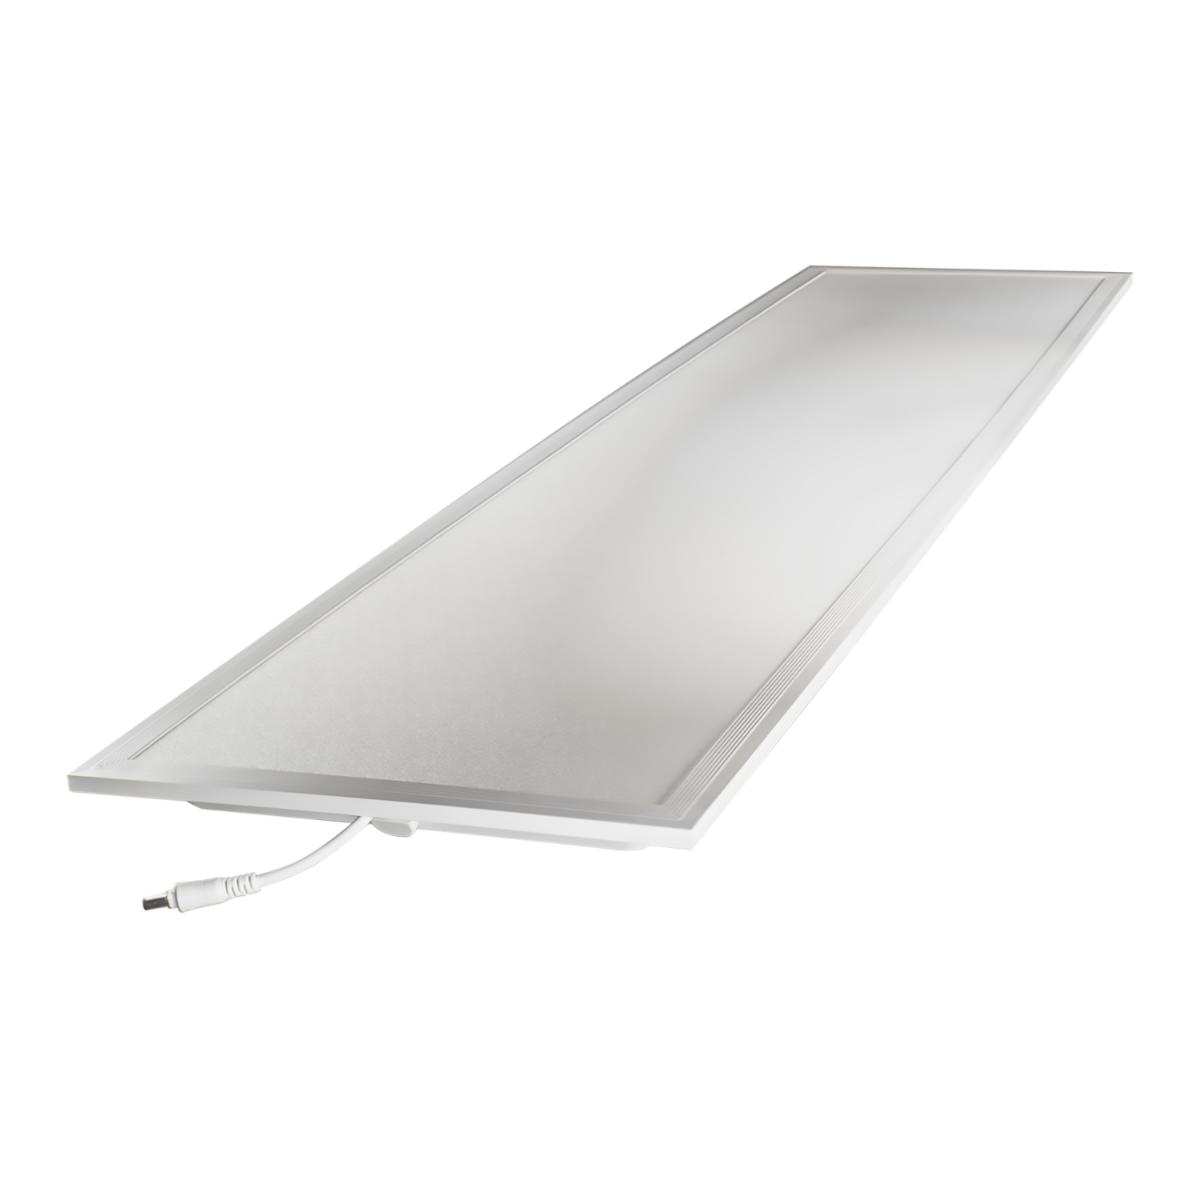 Noxion LED Paneeli Delta Pro Highlum V2.0 Xitanium DALI 40W 30x120cm 3000K 5280lm UGR <19 | Dali Himmennettävä - Lämmin Valkoinen - Korvaa 2x36W